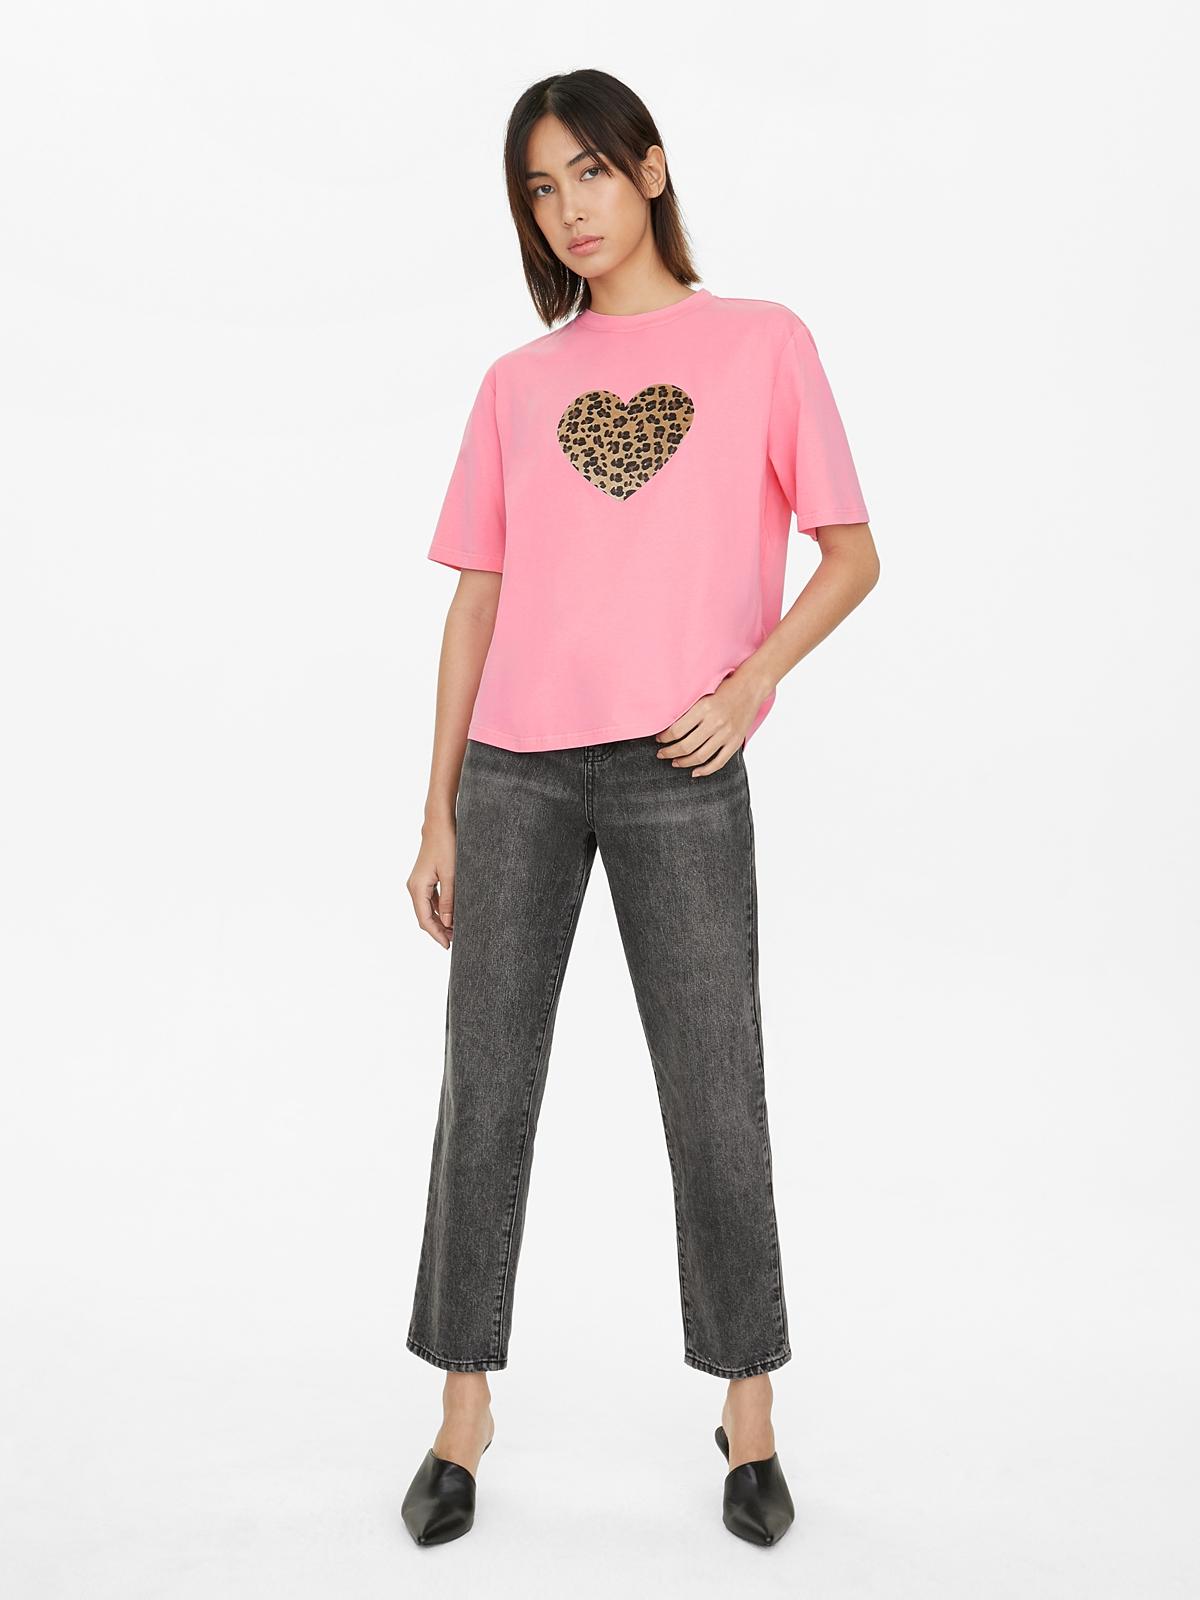 Leopard Heart Graphic Tee Pink